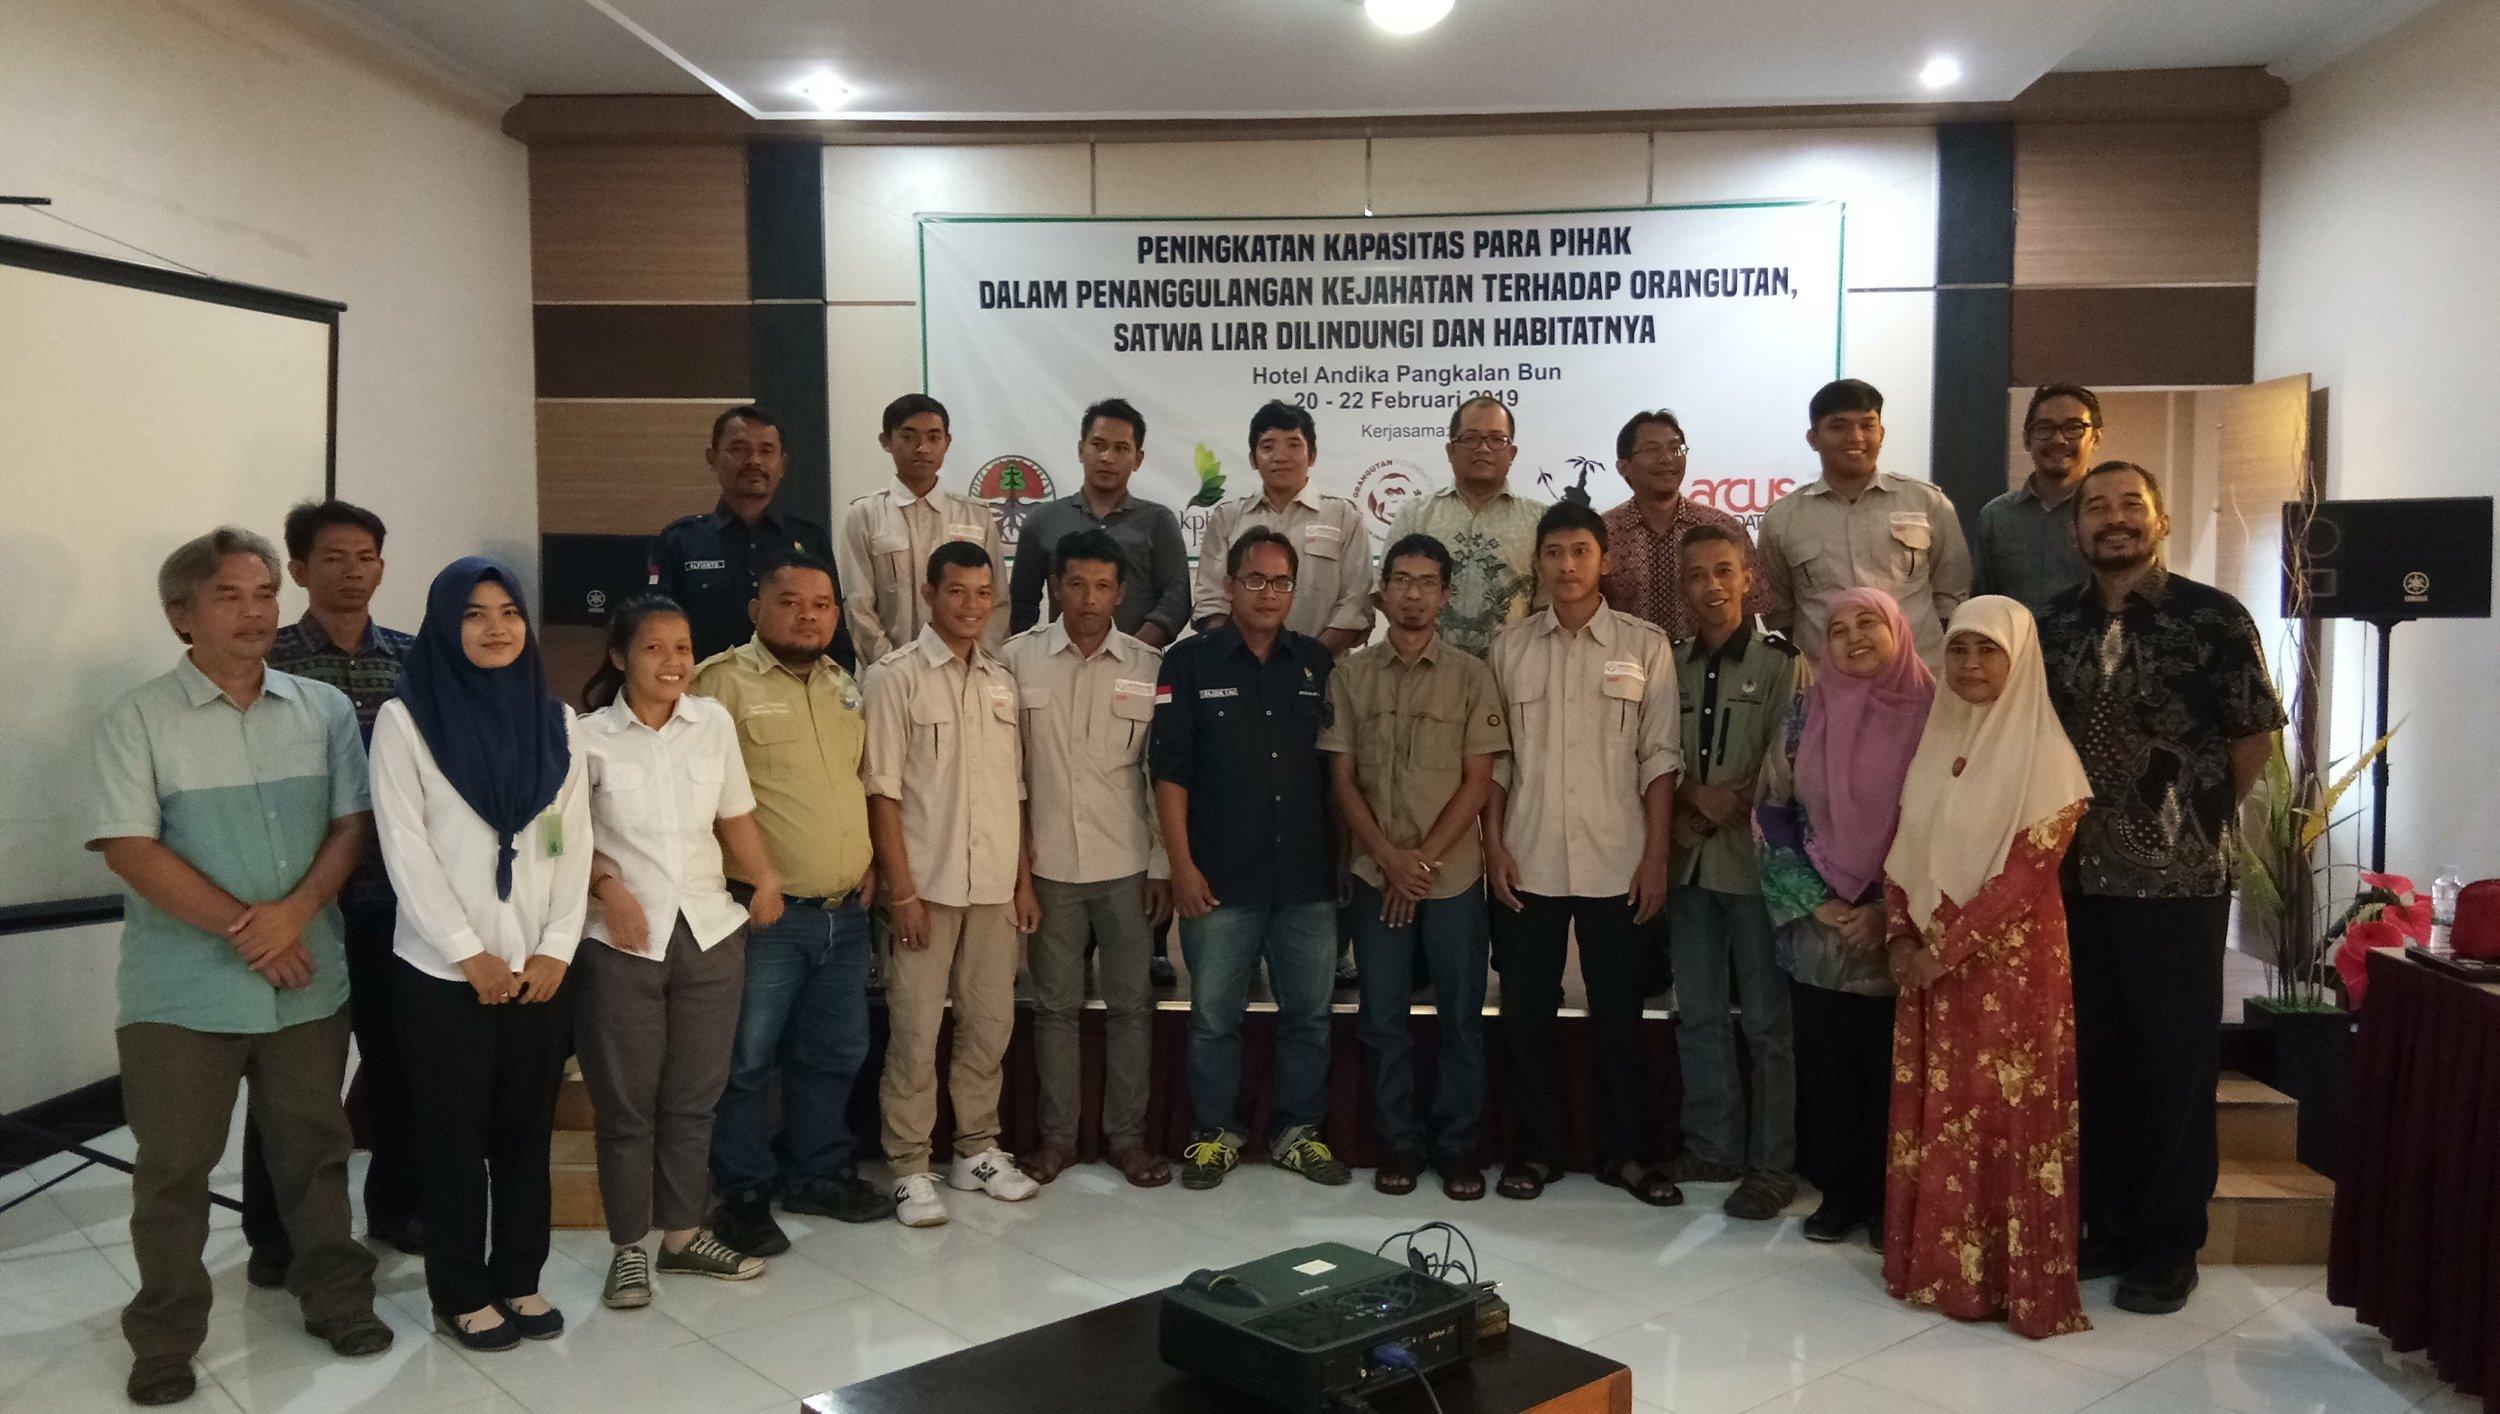 Workshop attendees included Yayorin, Orangutan Foundation, SKW II Balai KSDA Kalimantan Tengah, Tanjung Puting National Park Office, Sukamara-Lamandau Regional Forest Service Office (KPHP) , Seruyan Regional Forestry Service Office (KPHP), Nangamatu Village - Belantikan Raya and Pangkalan Bun Antakusuma University.